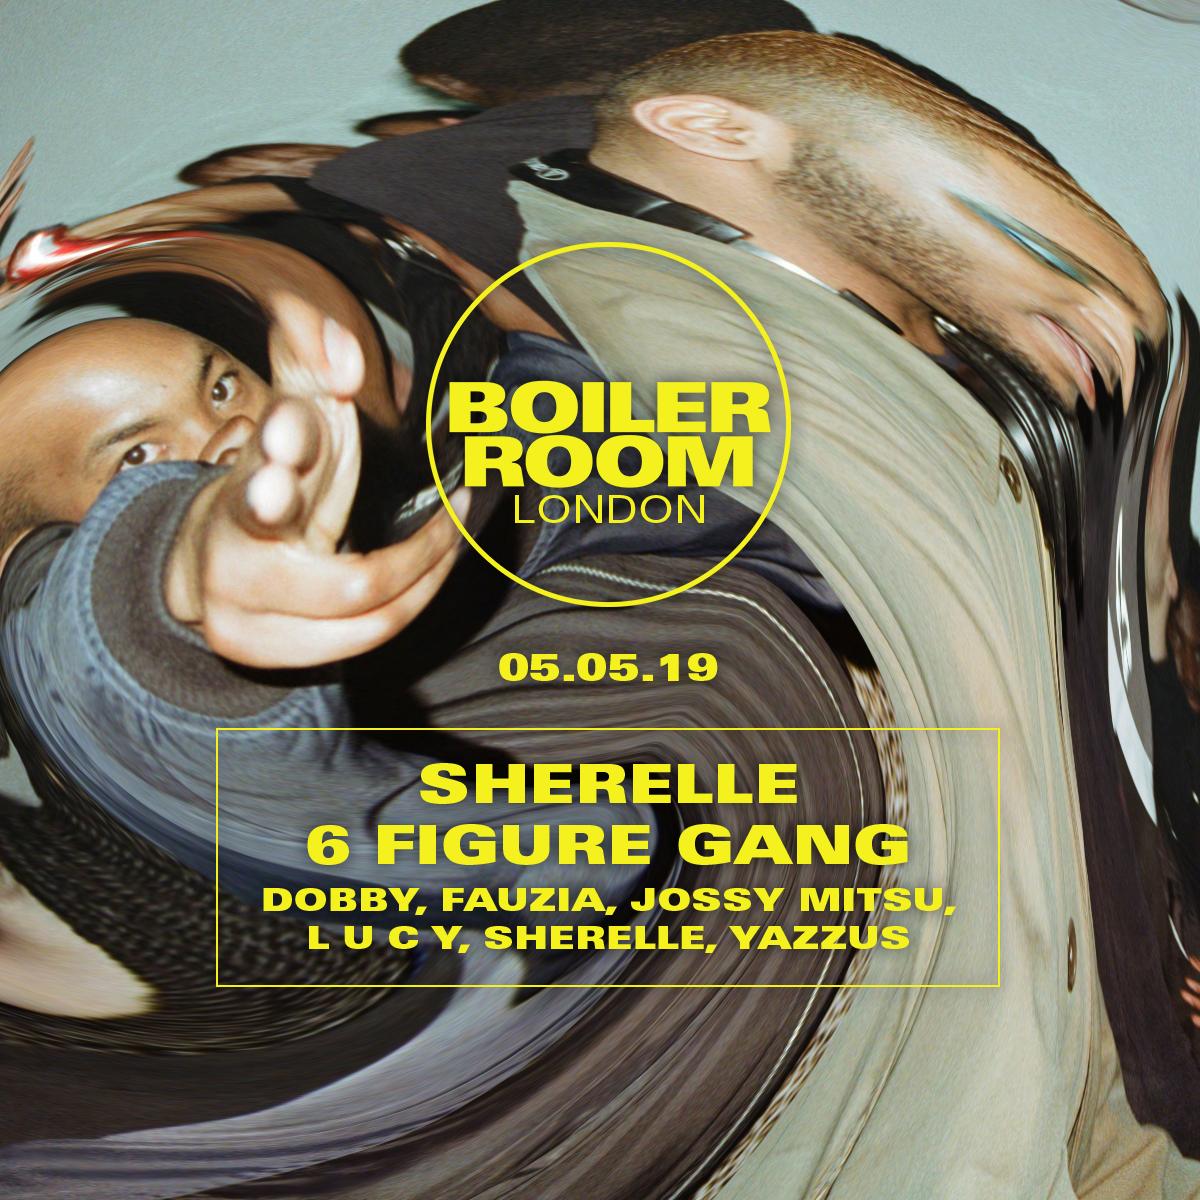 London: Sherelle + 6 Figure Gang Flyer Image